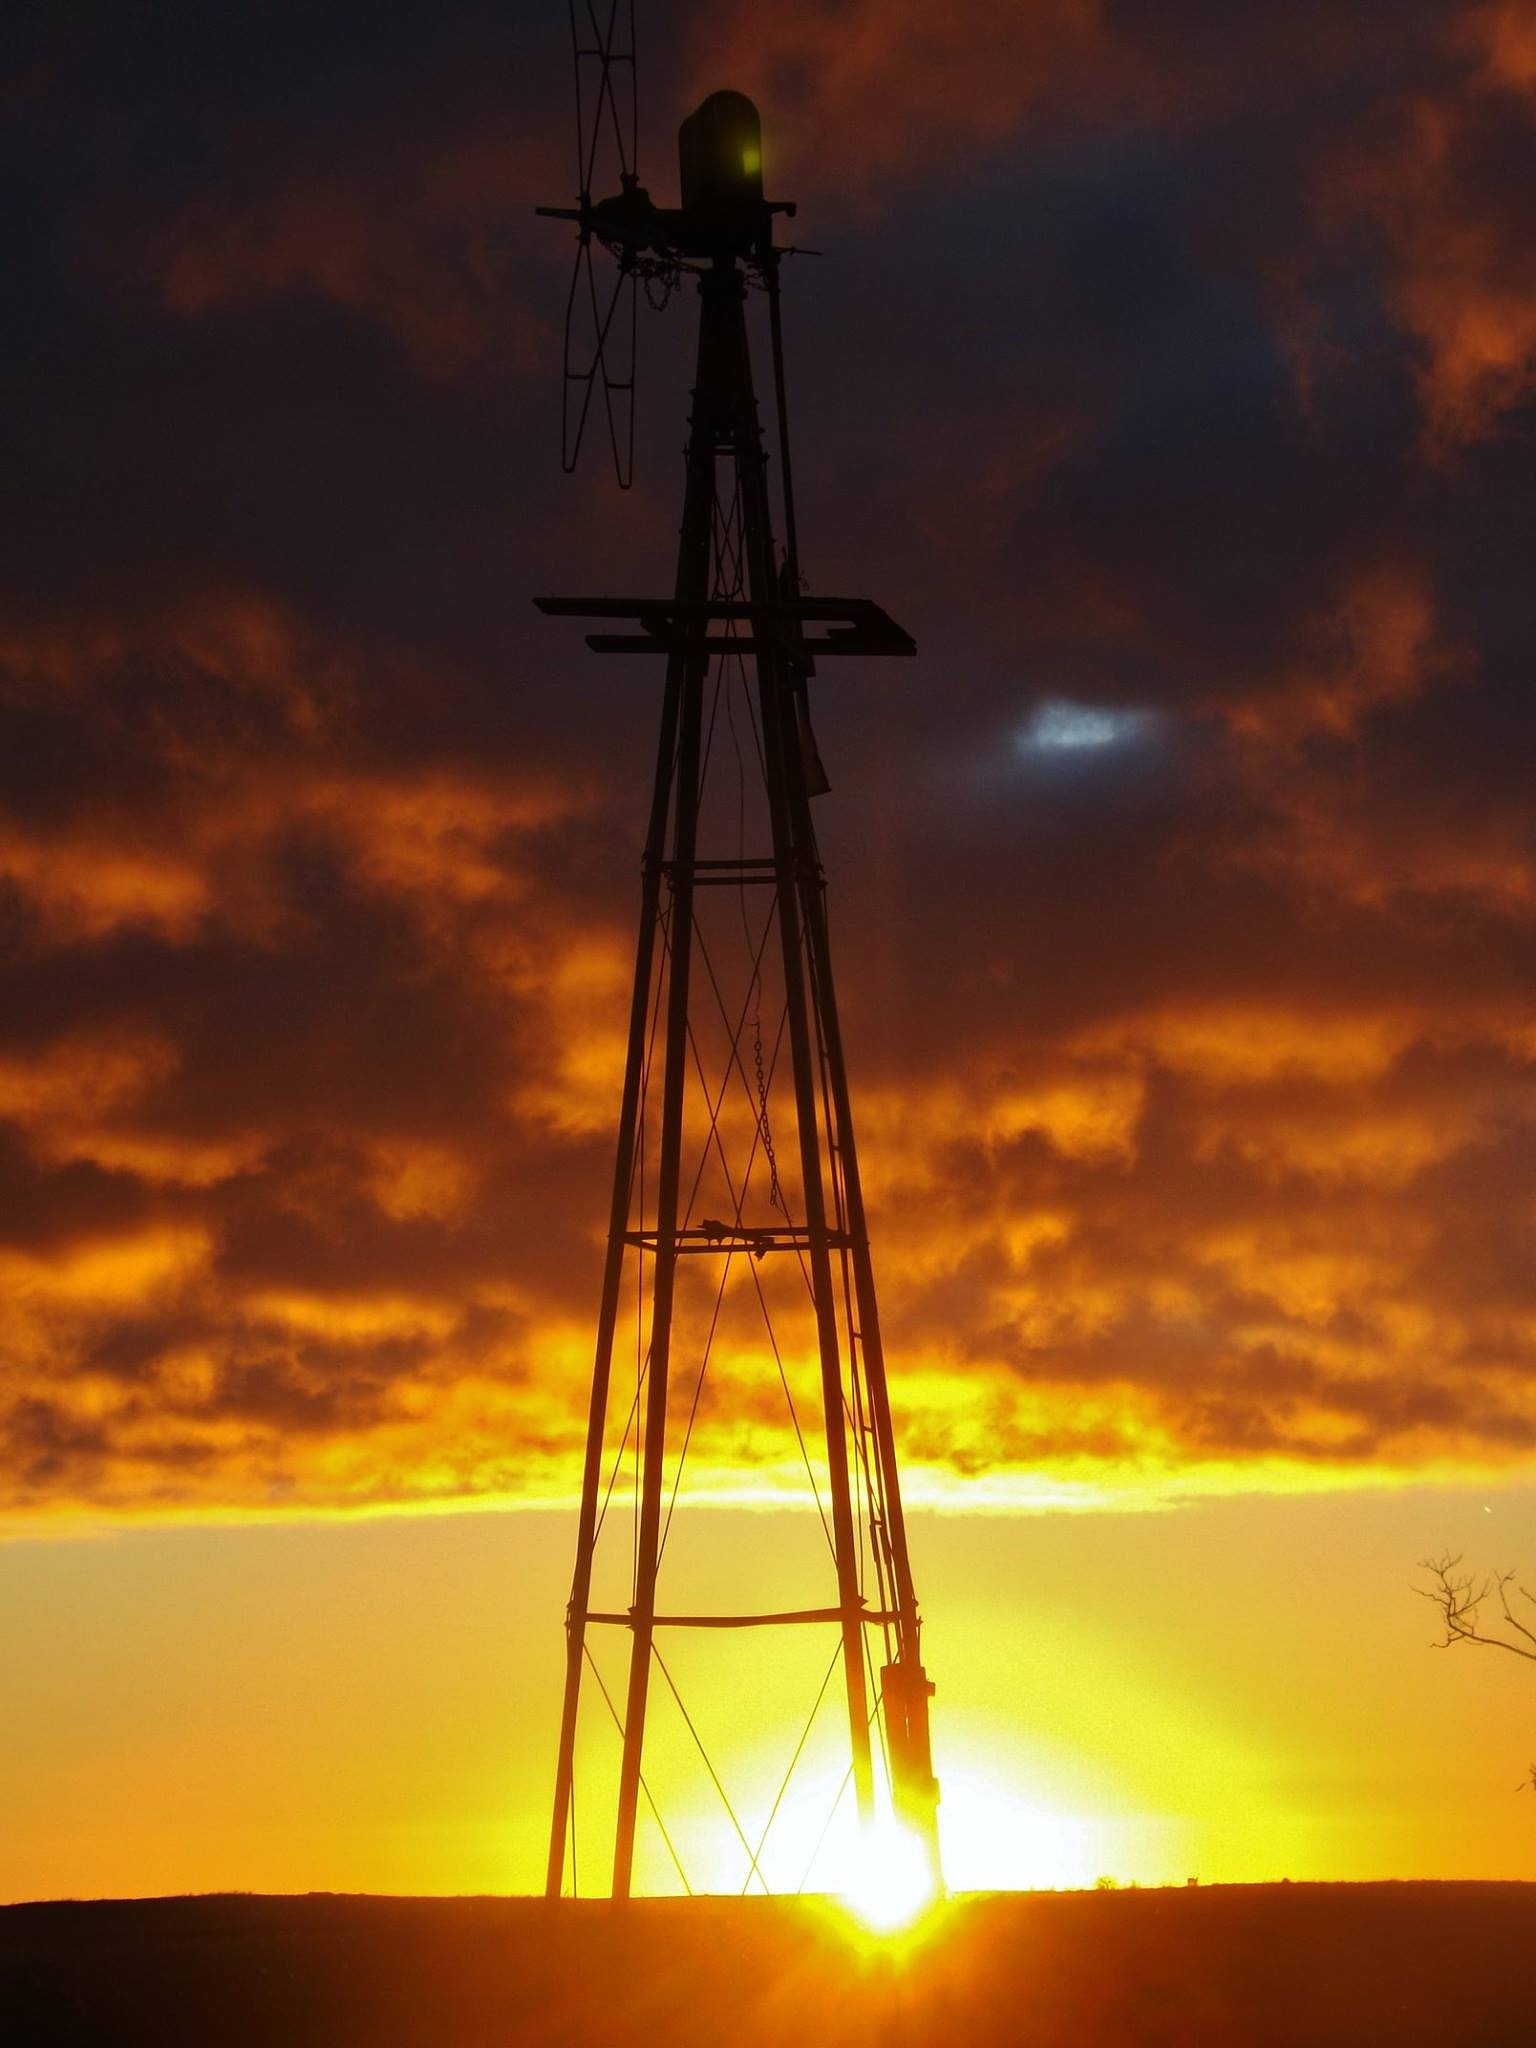 sunrise in Sask by Rhyland Cottingham